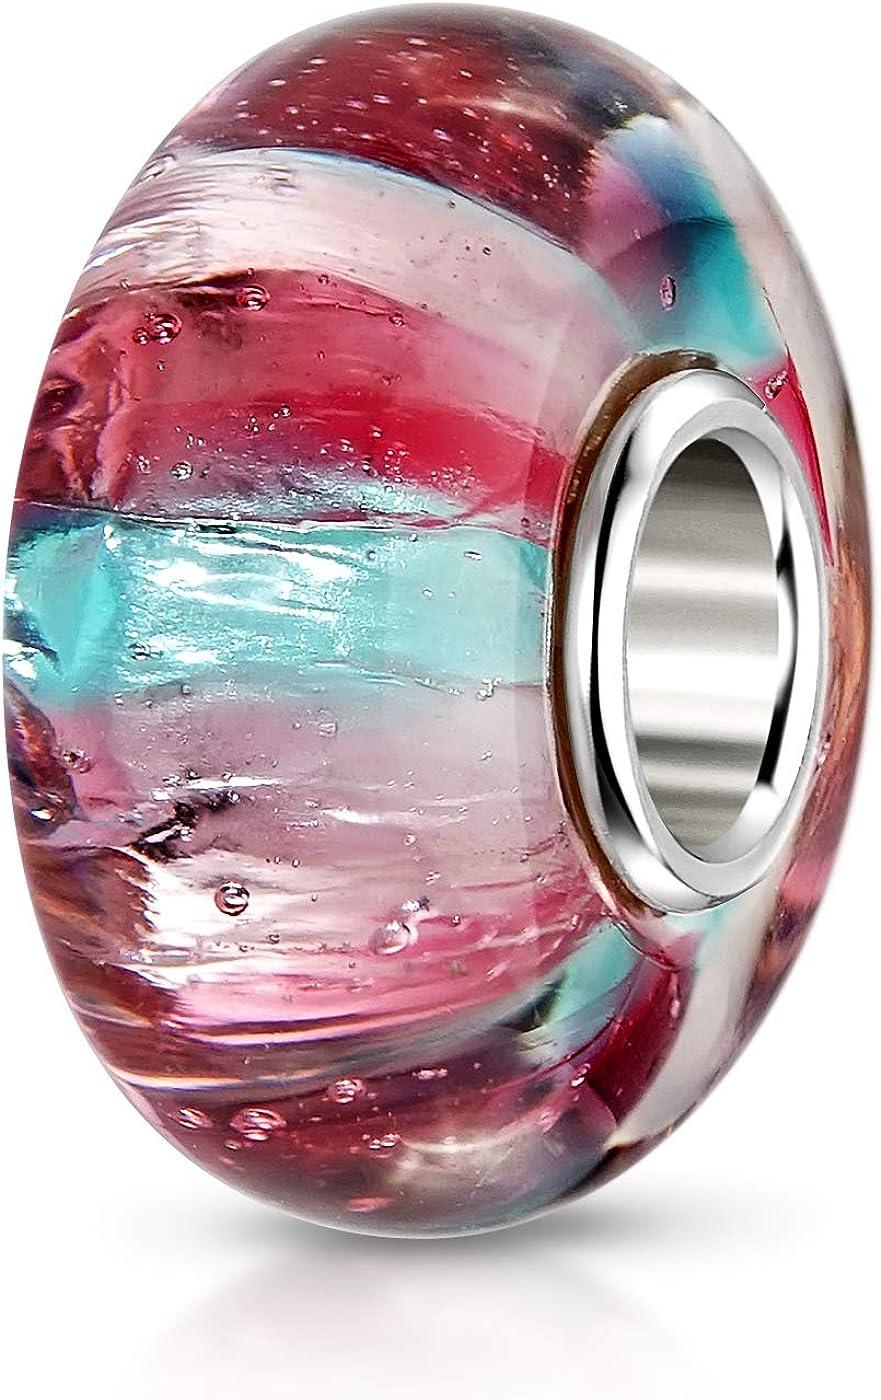 MATERIA Murano cristal Beads Perla Turquesa Rojo Rosa–Purpurina Charms joyas con funda de 925plata para pulsera # 1047